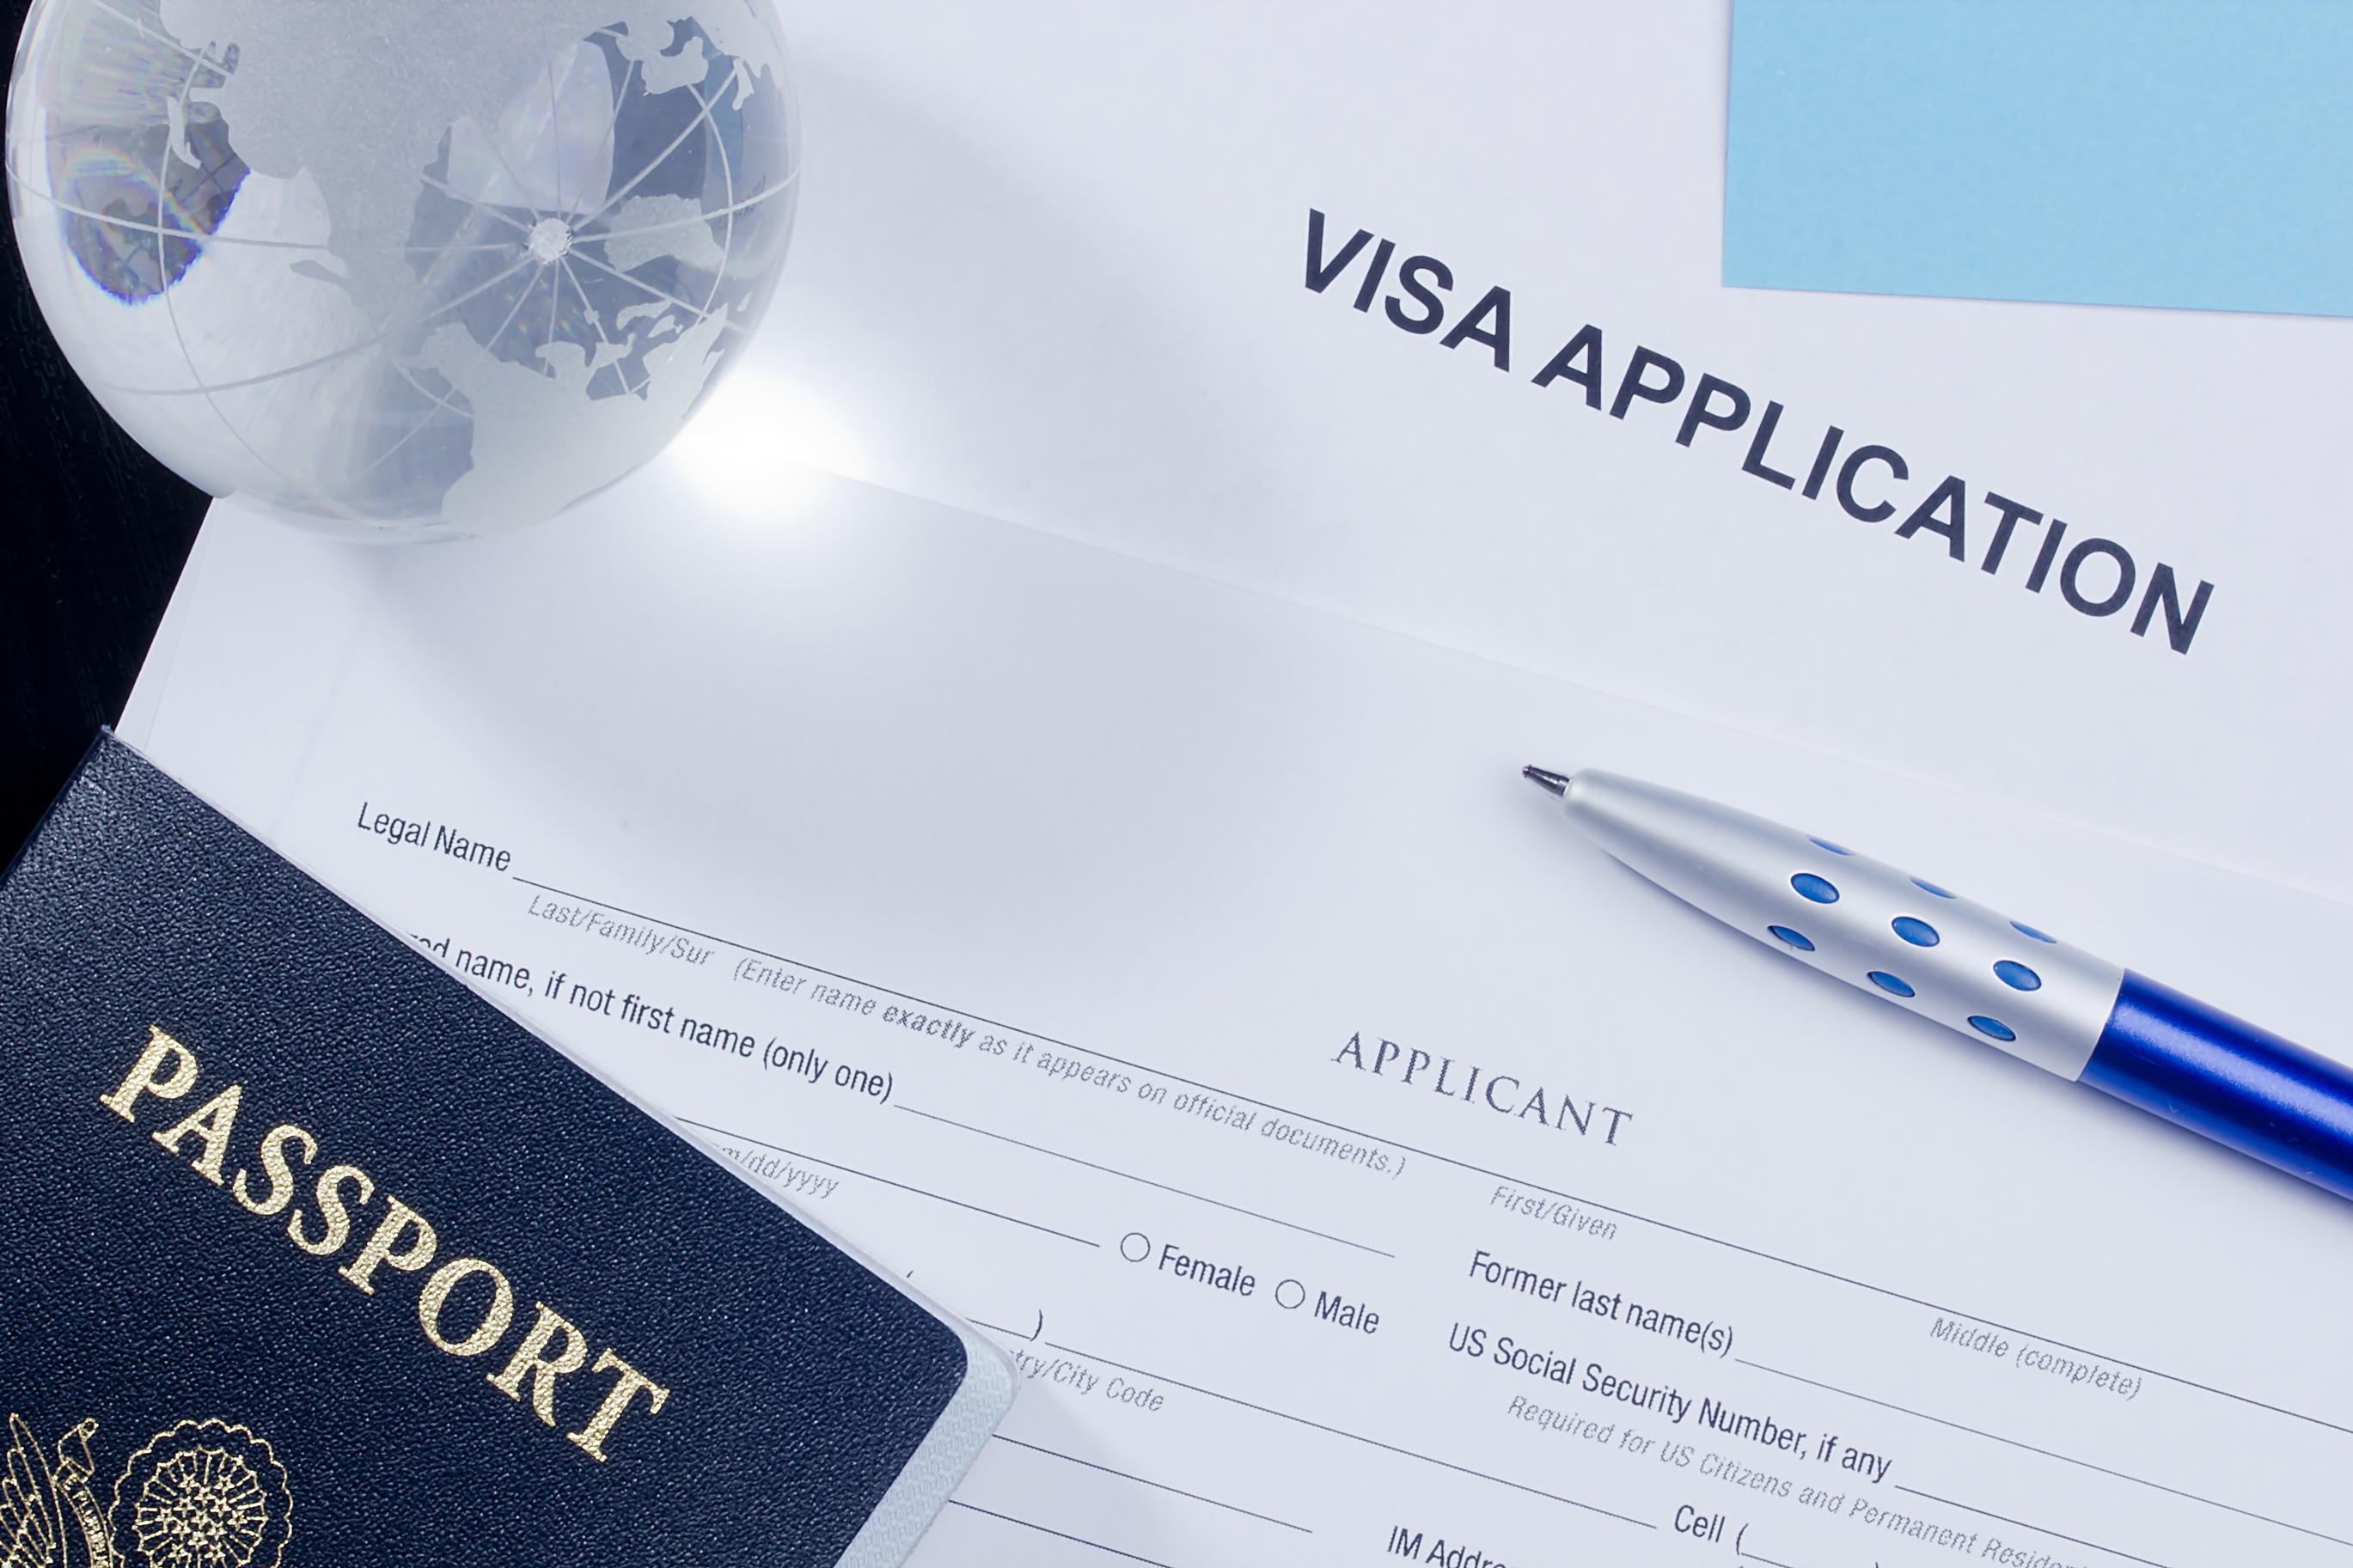 Start your 457 visa application